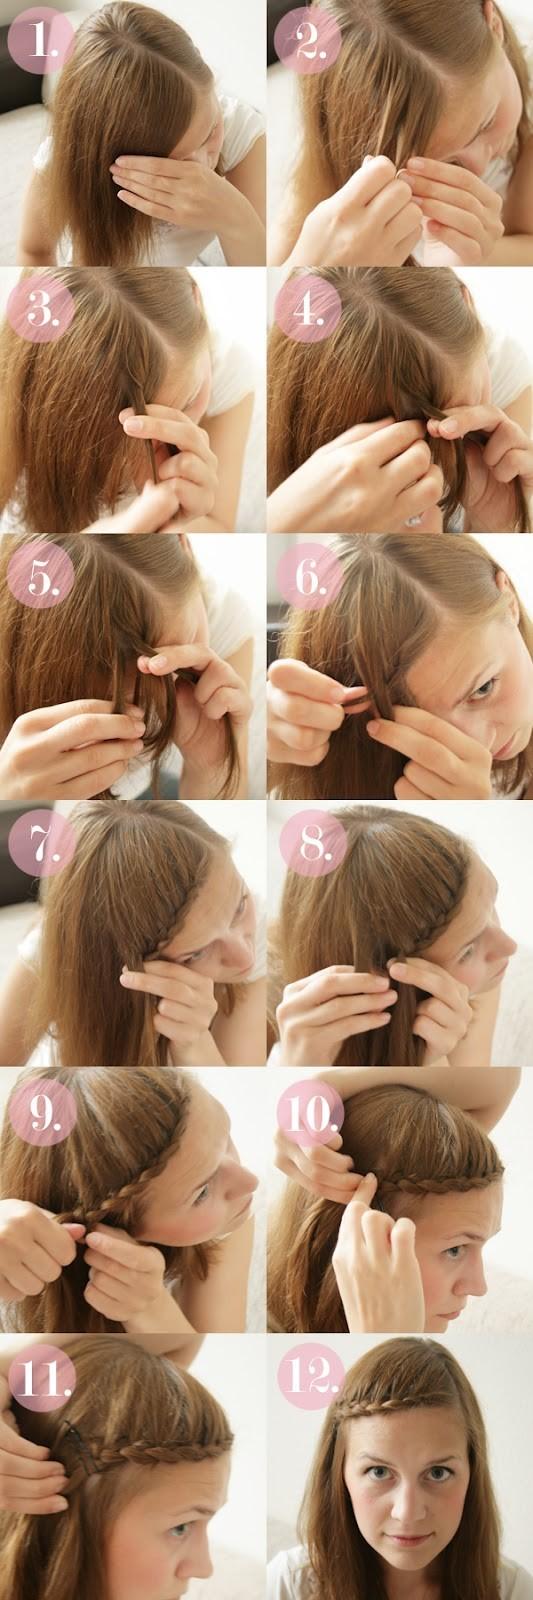 Super 15 Braided Bangs Tutorials Cute Easy Hairstyles Pretty Designs Hairstyles For Women Draintrainus